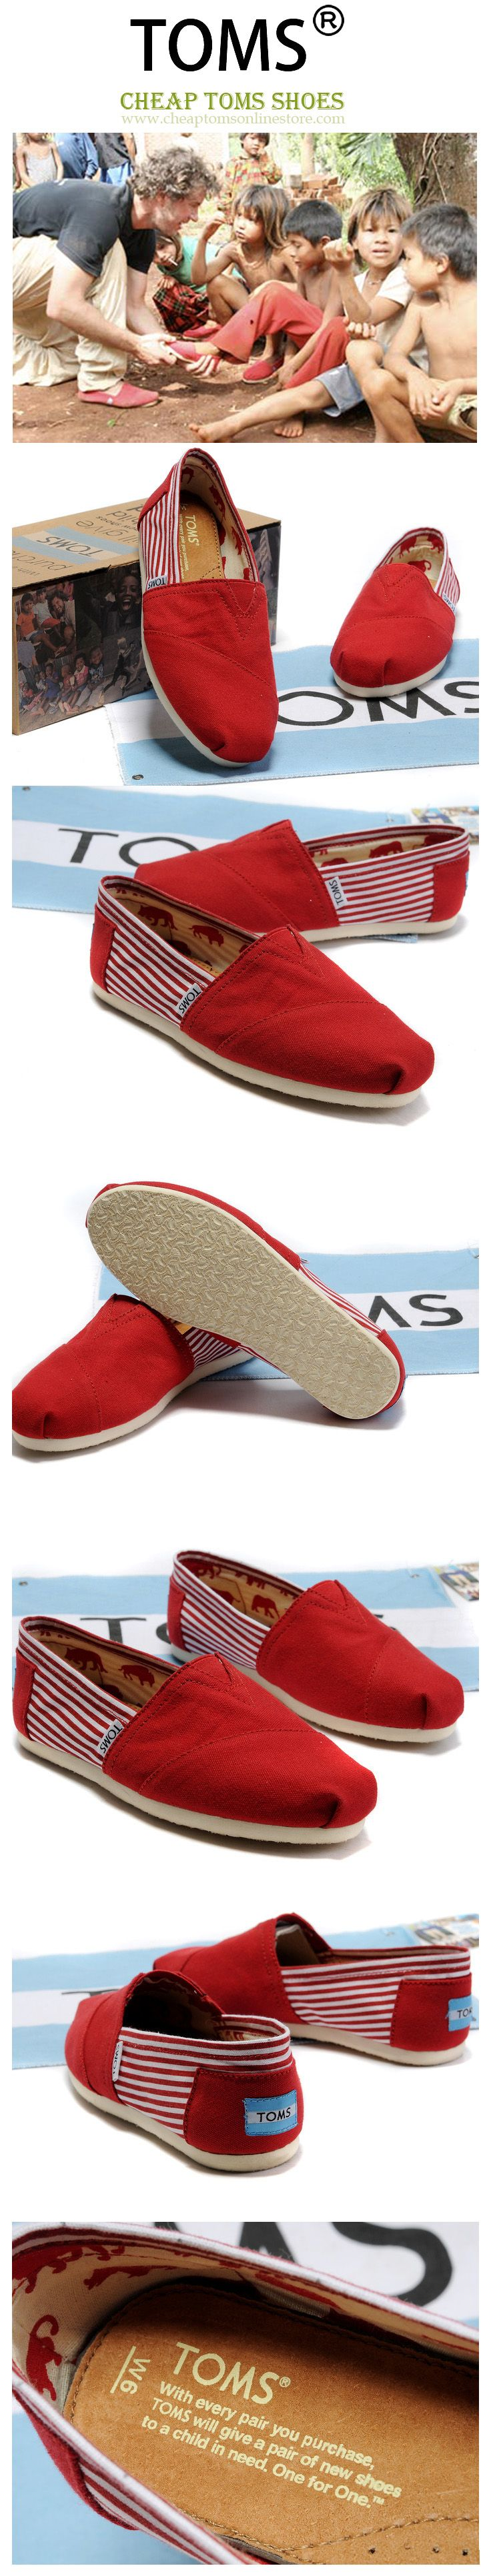 cheap toms shoes outlet online $16.48